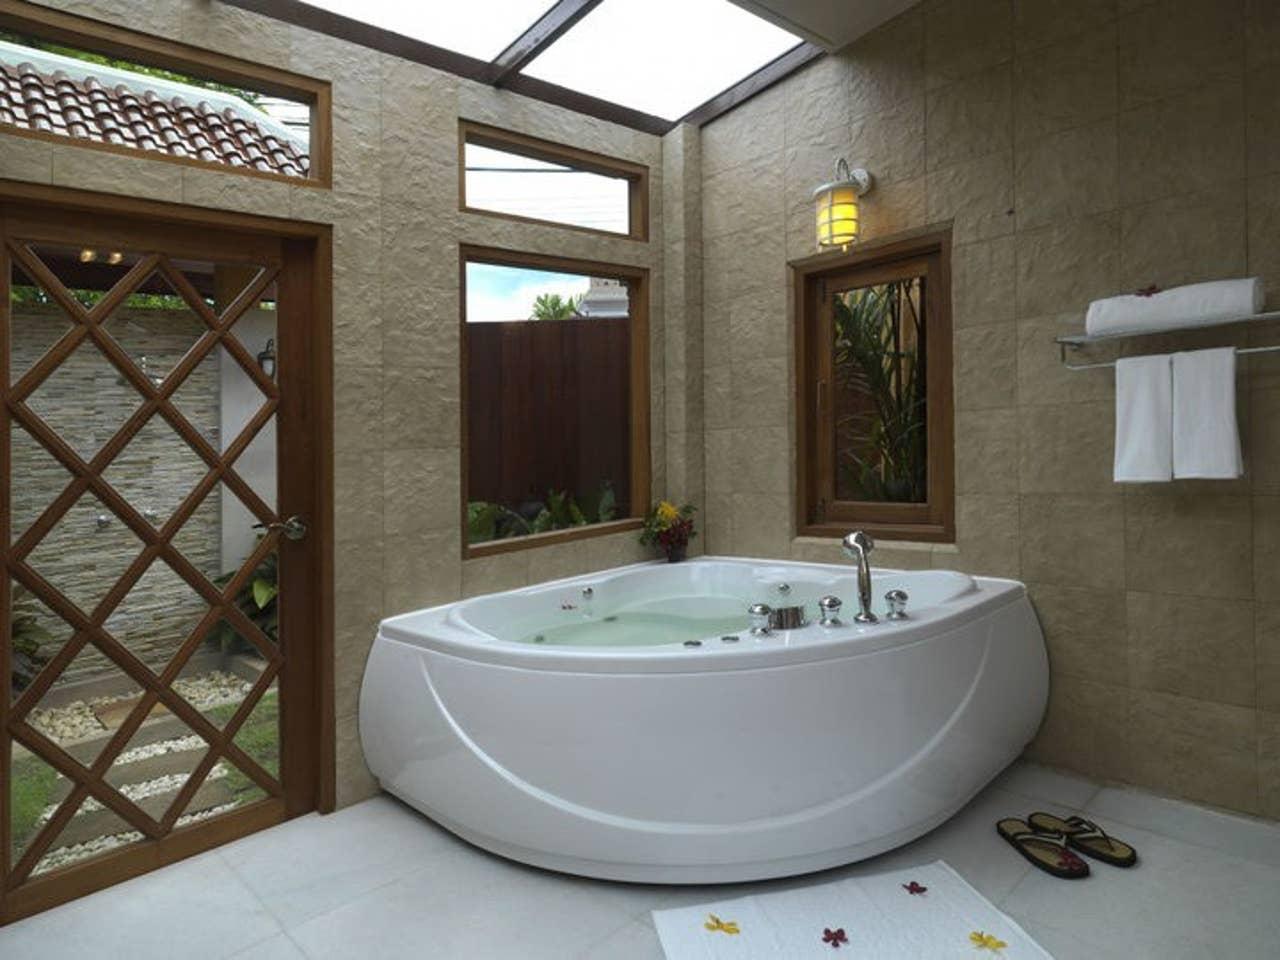 Exclusive Balinese Pool Villa in Pattaya 7 ห้องนอน 7 ห้องน้ำส่วนตัว ขนาด 800 ตร.ม. – เทพประสิทธิ์